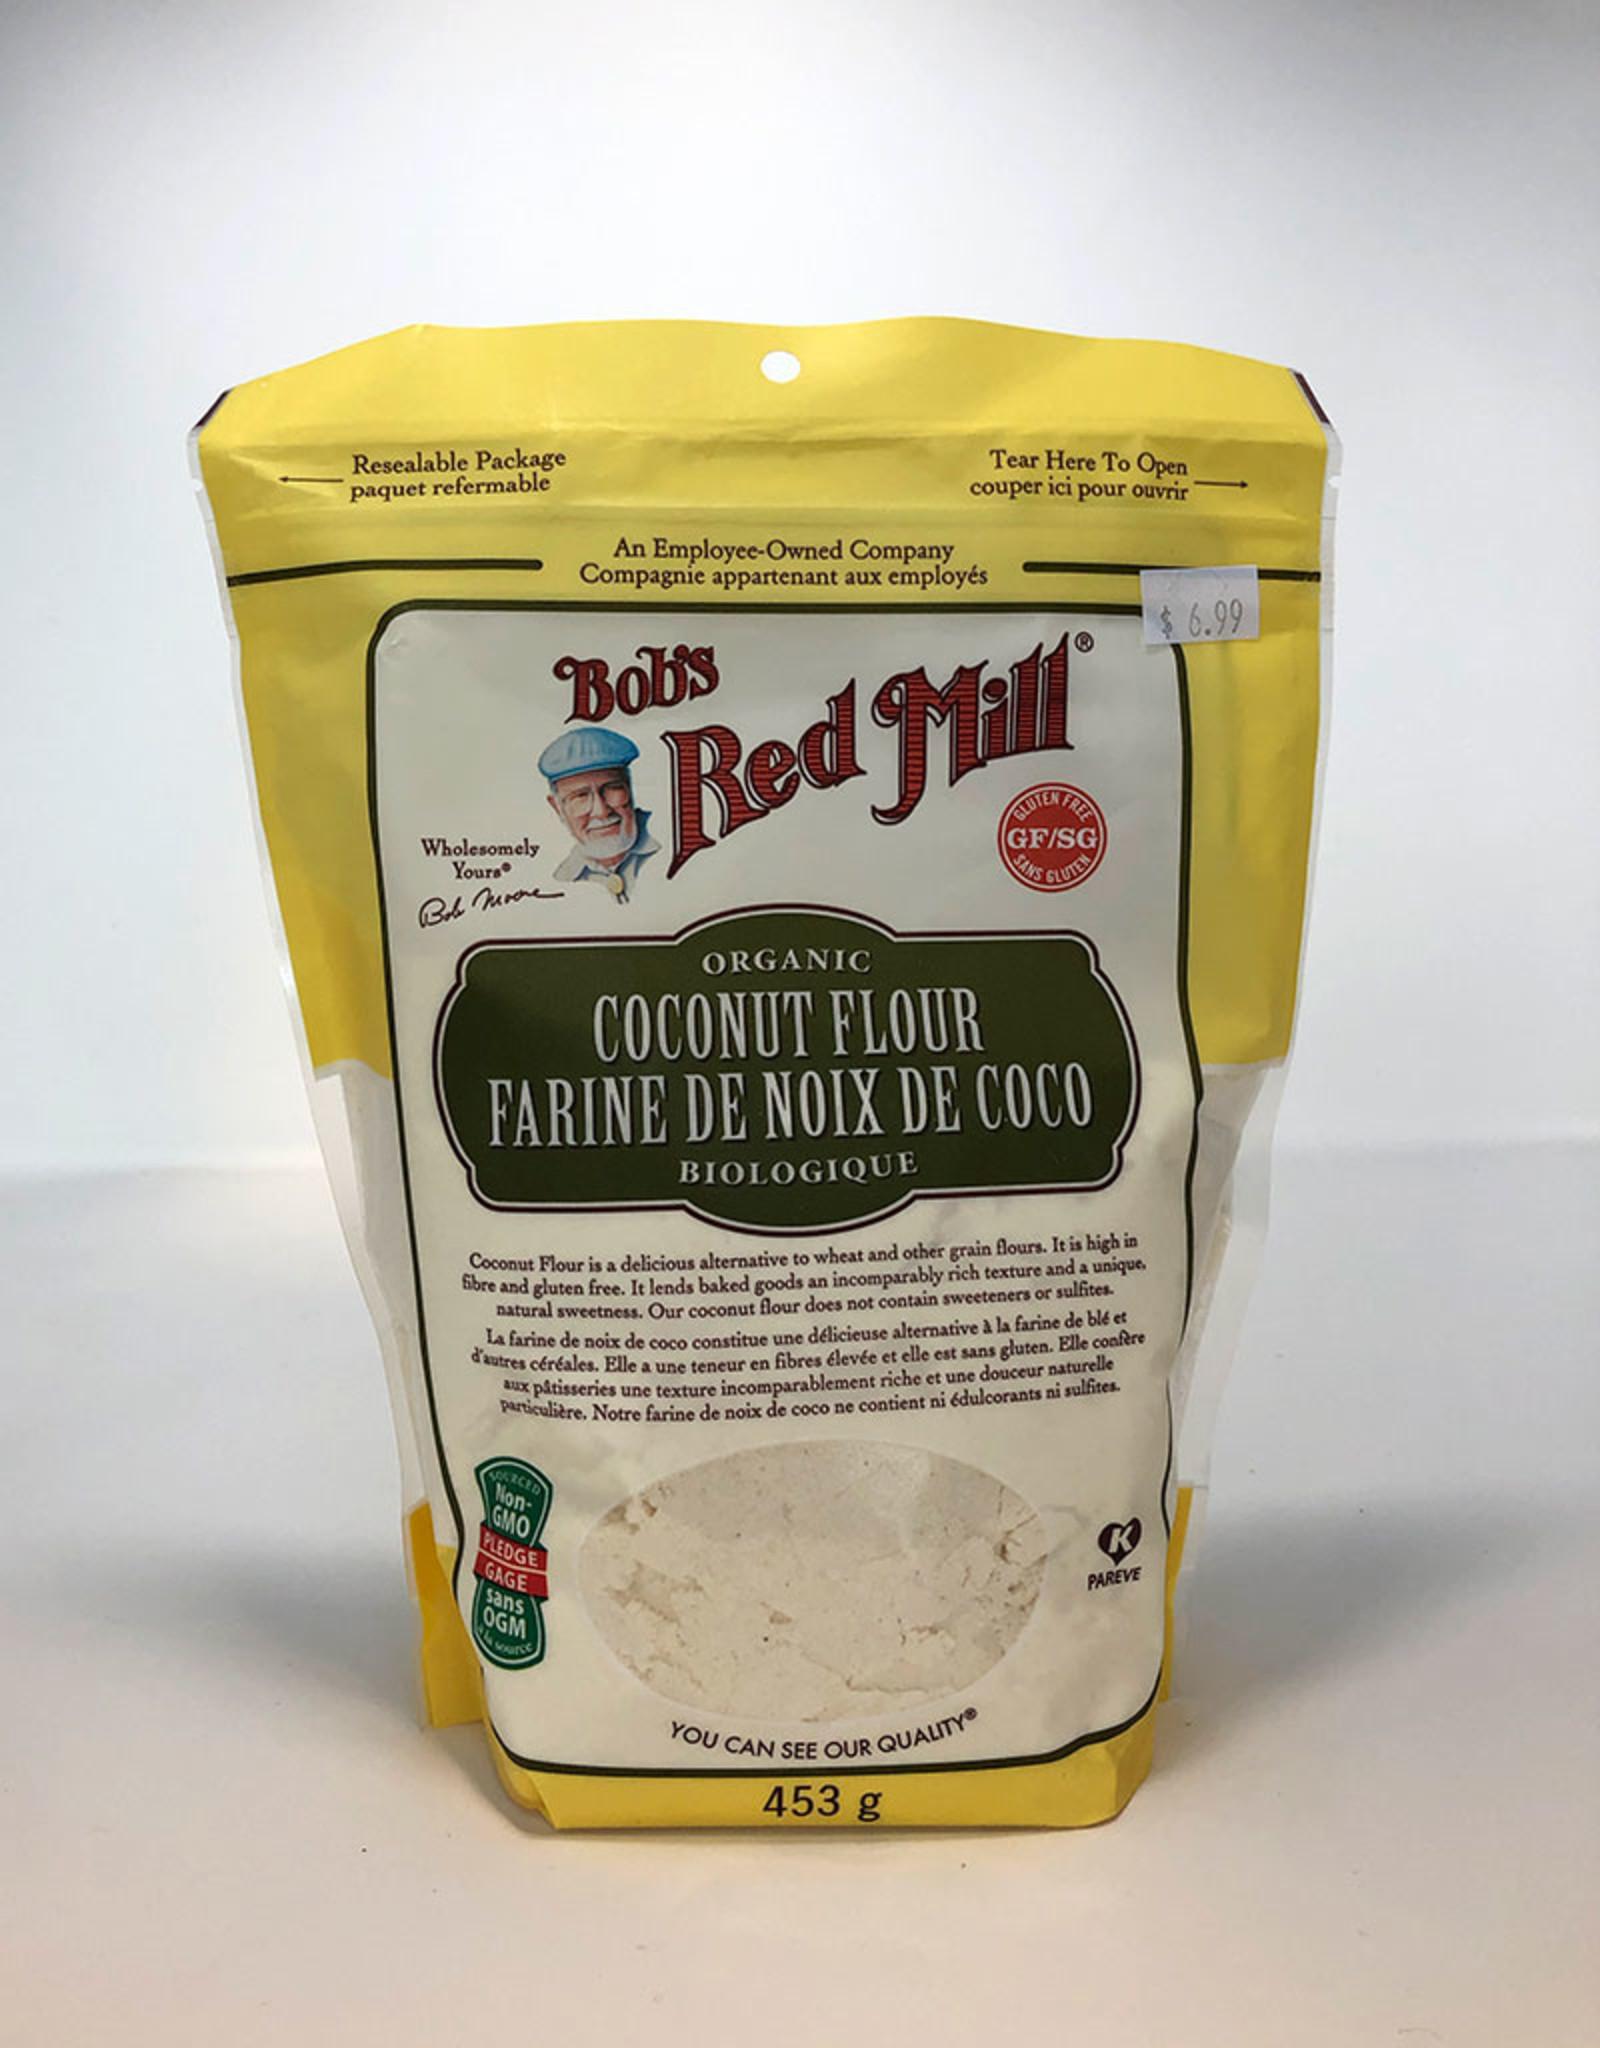 Bob's Red Mill Bobs Red Mill - Organic Coconut Flour (453g)